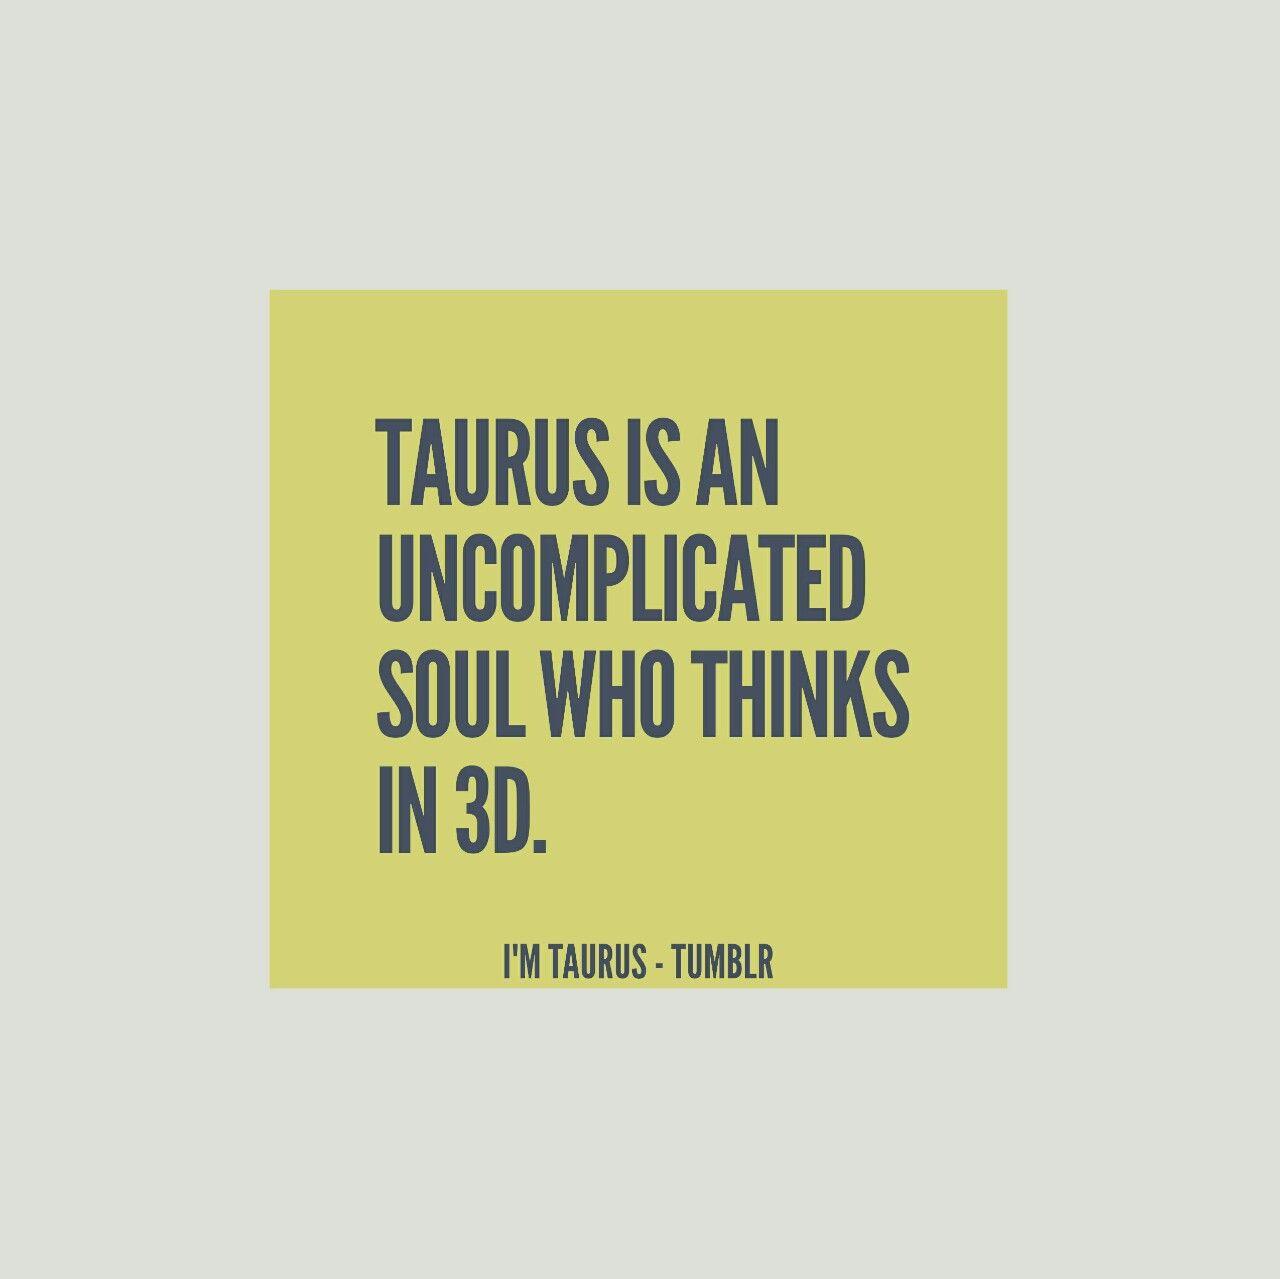 I'm Taurus